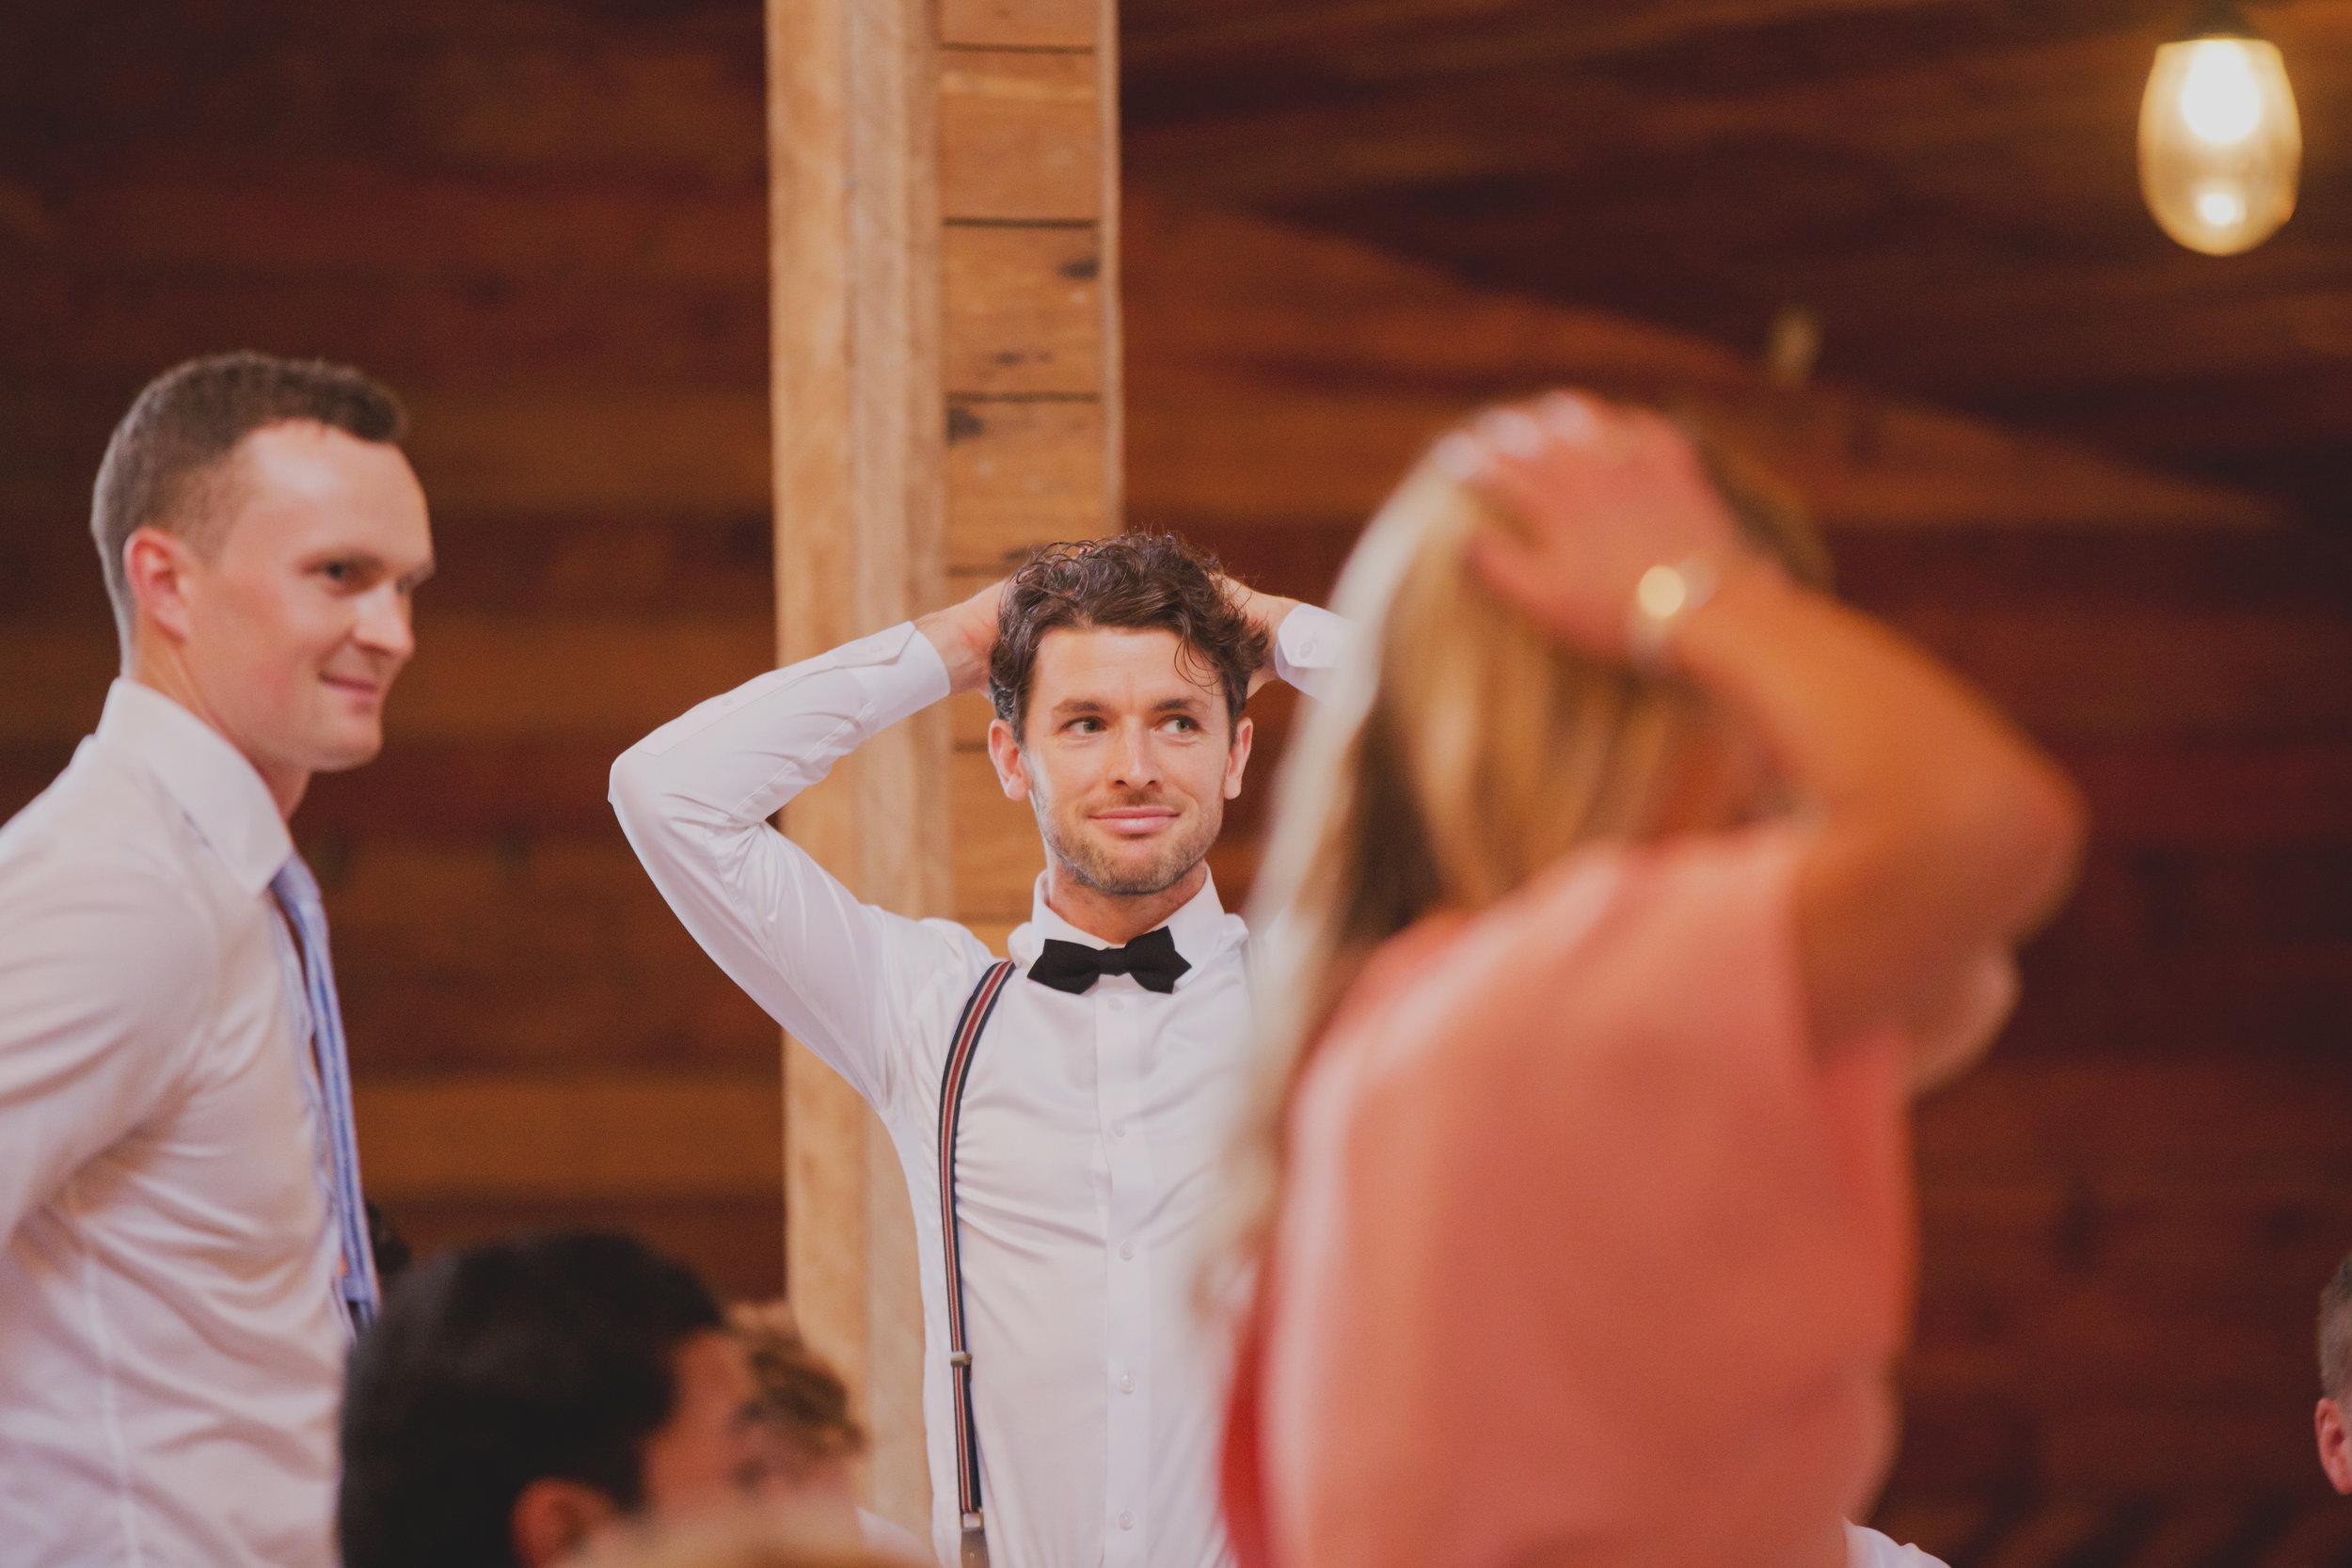 wellington wedding photography NZ - 1127.JPG